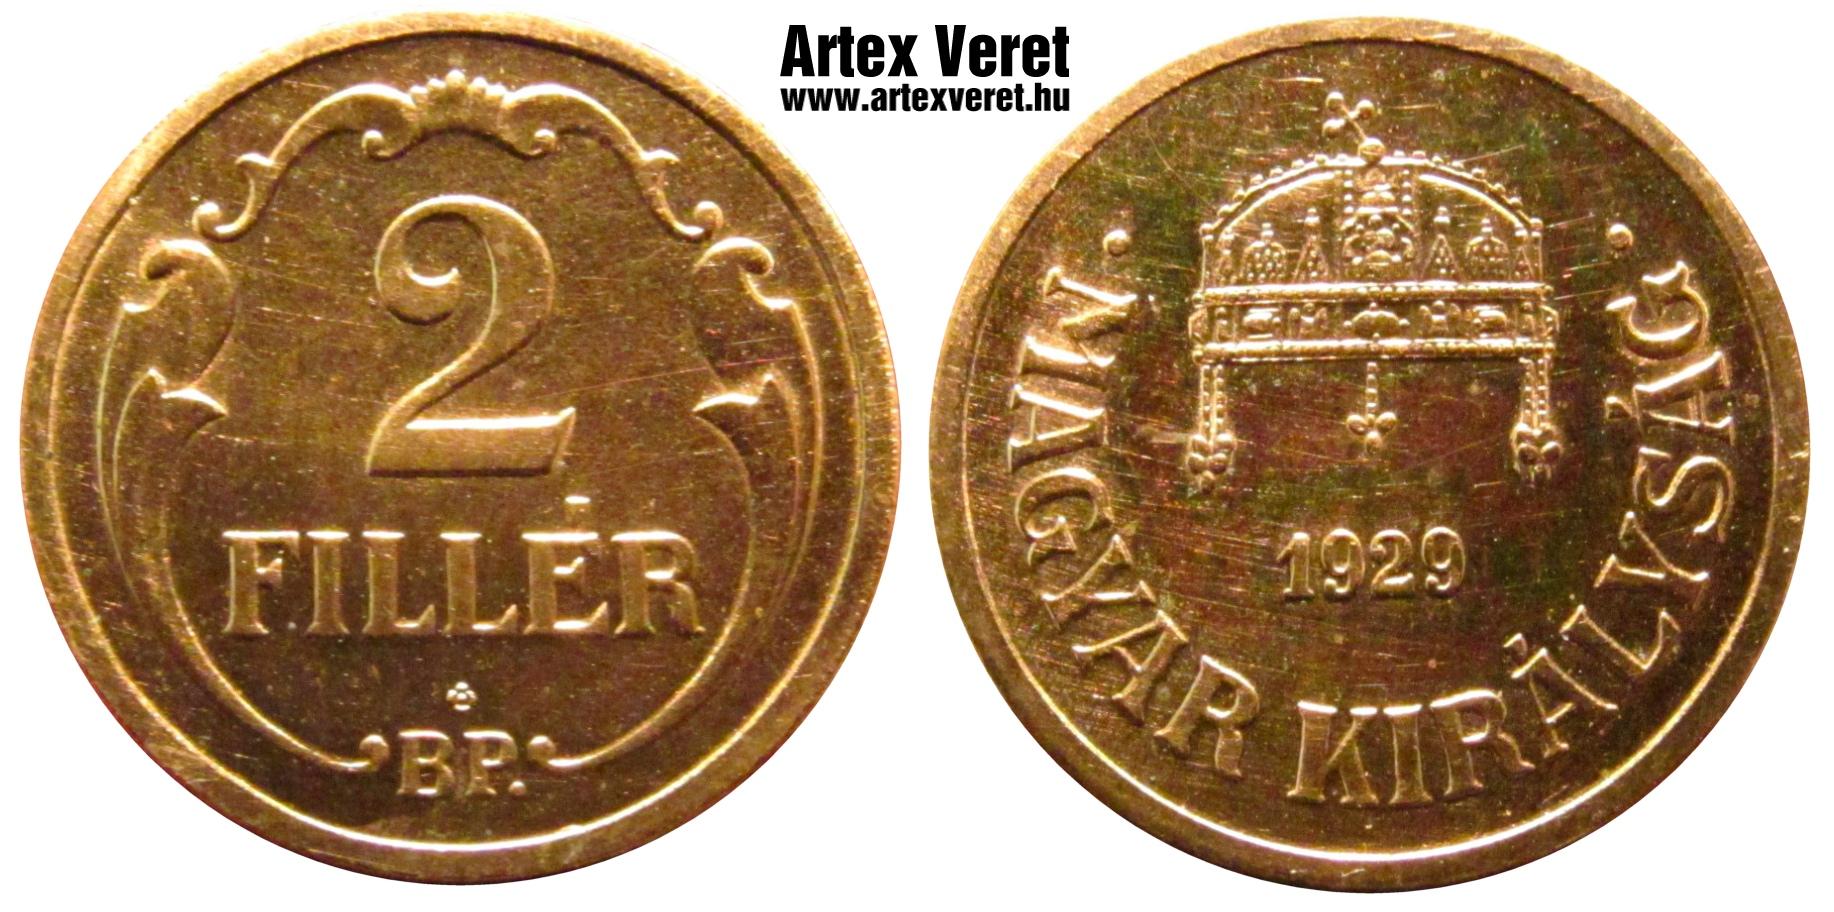 http://www.artexveret.hu/pengo-artex-utanveret/www_artexveret_hu_bronz_1929_rozettas_artex_utanveret_2_filler.jpg